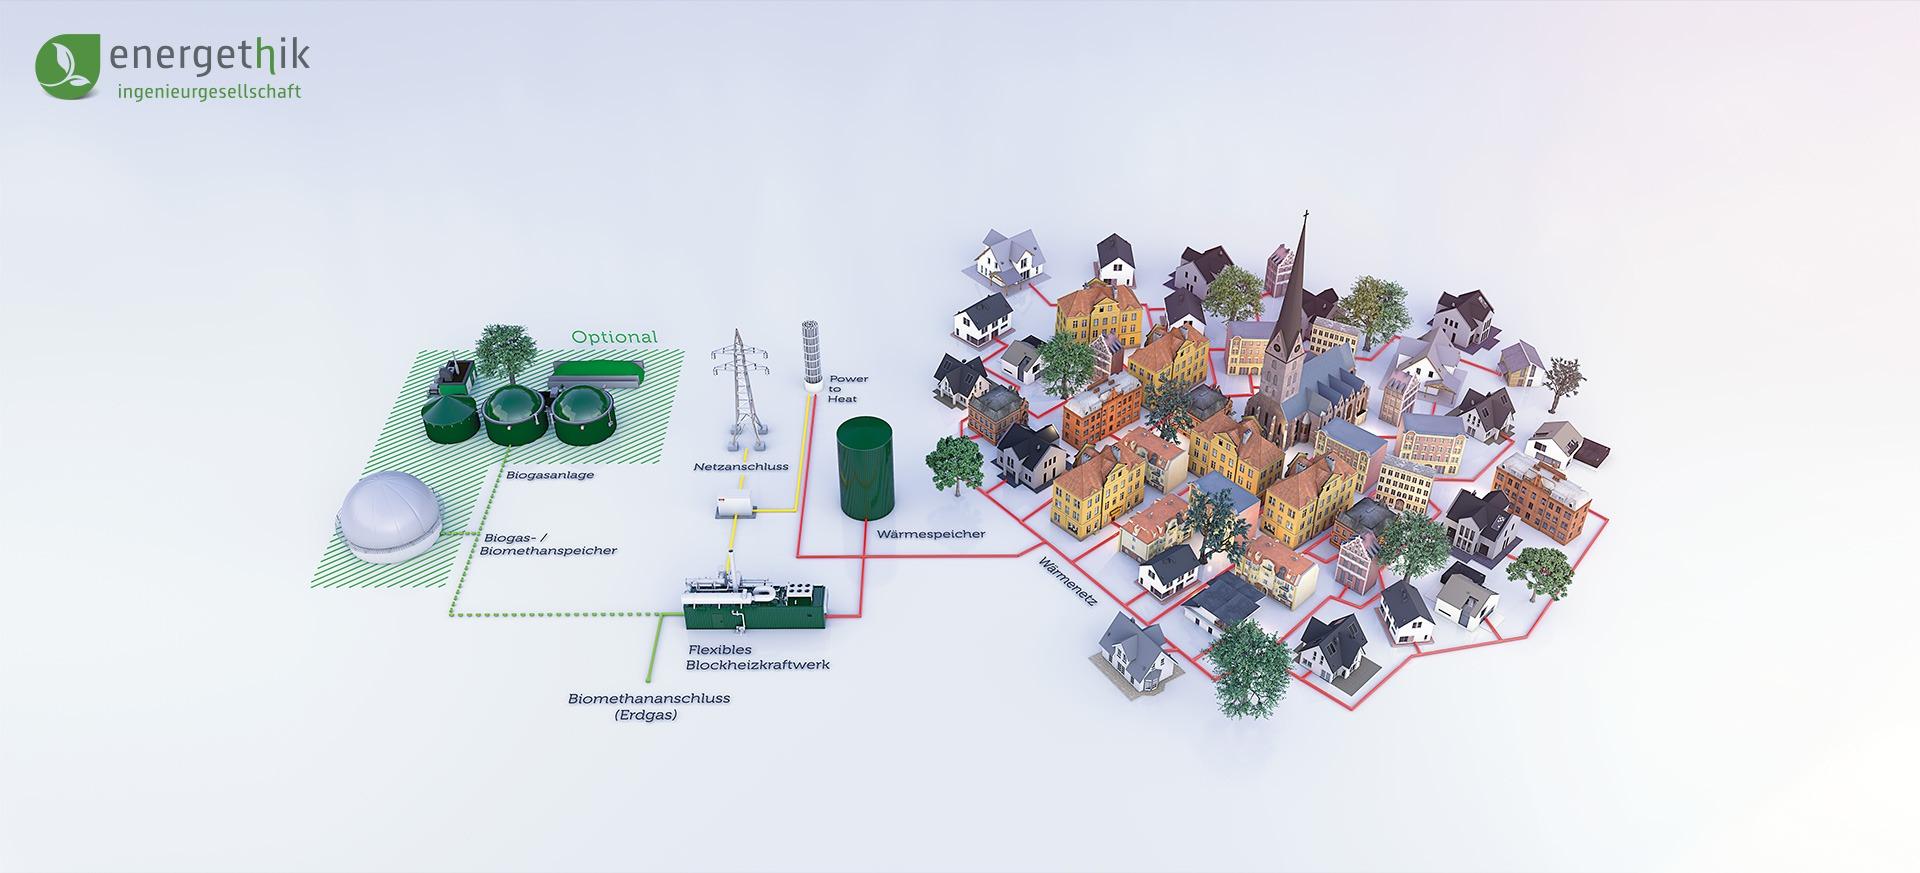 Regeneratives Speicherkraftwerk